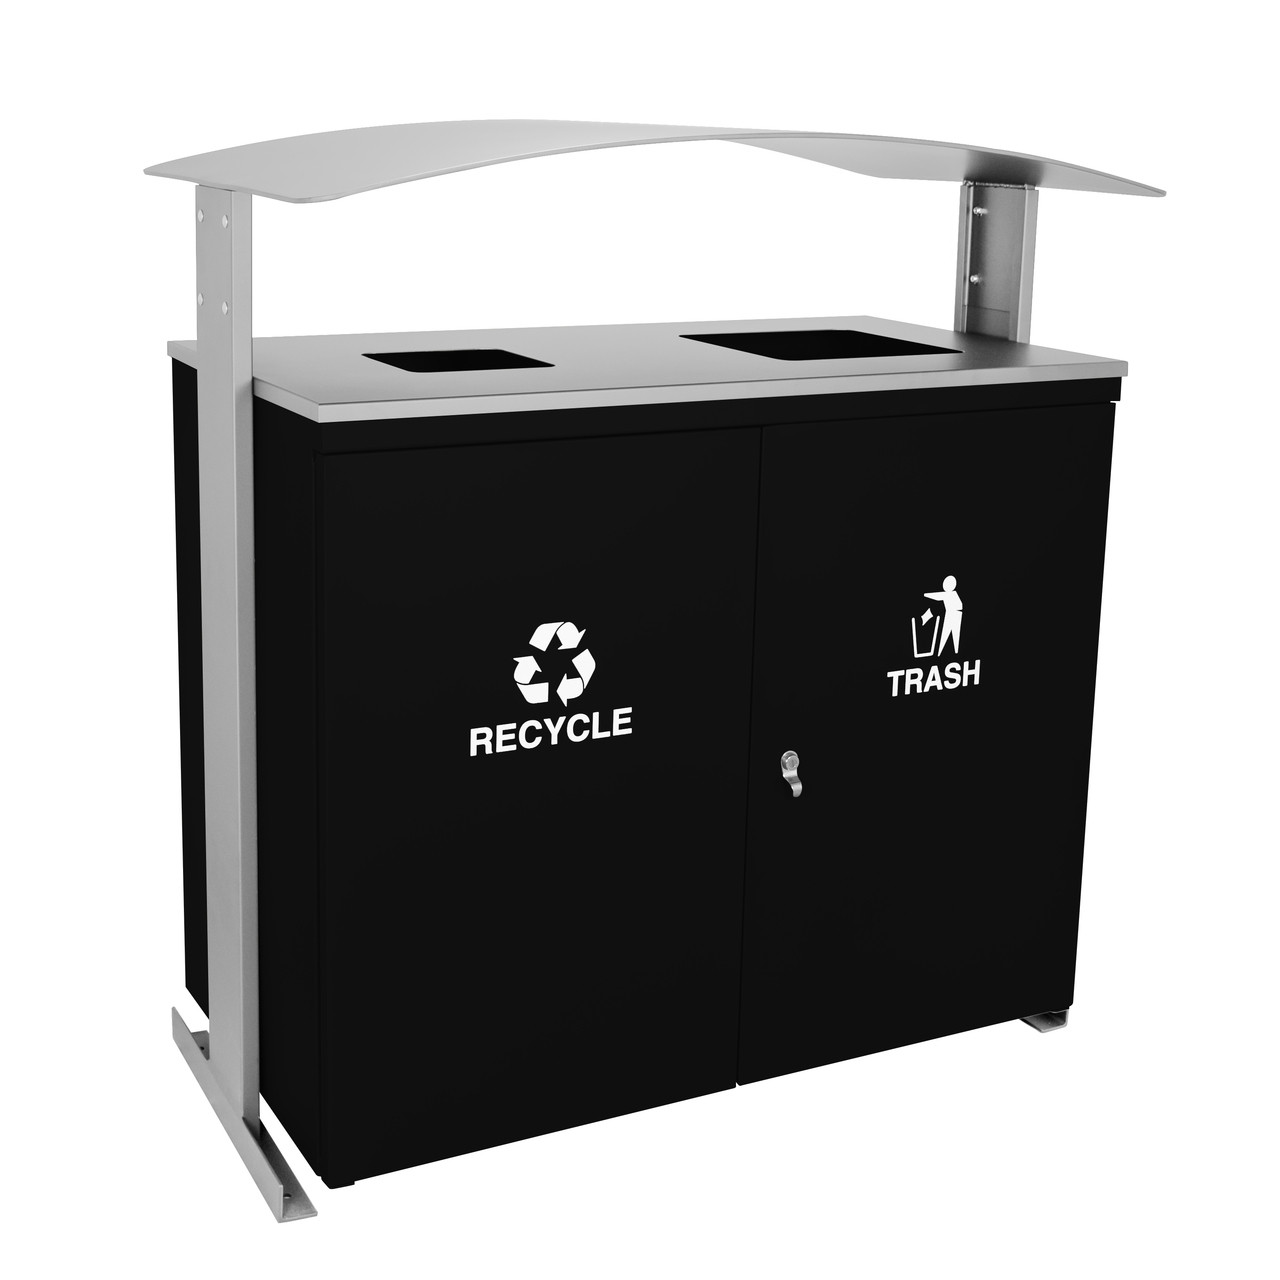 90 Gallon Ellipse Dual Recycling Bin RGU-3645 BLK/HMGX BLACK